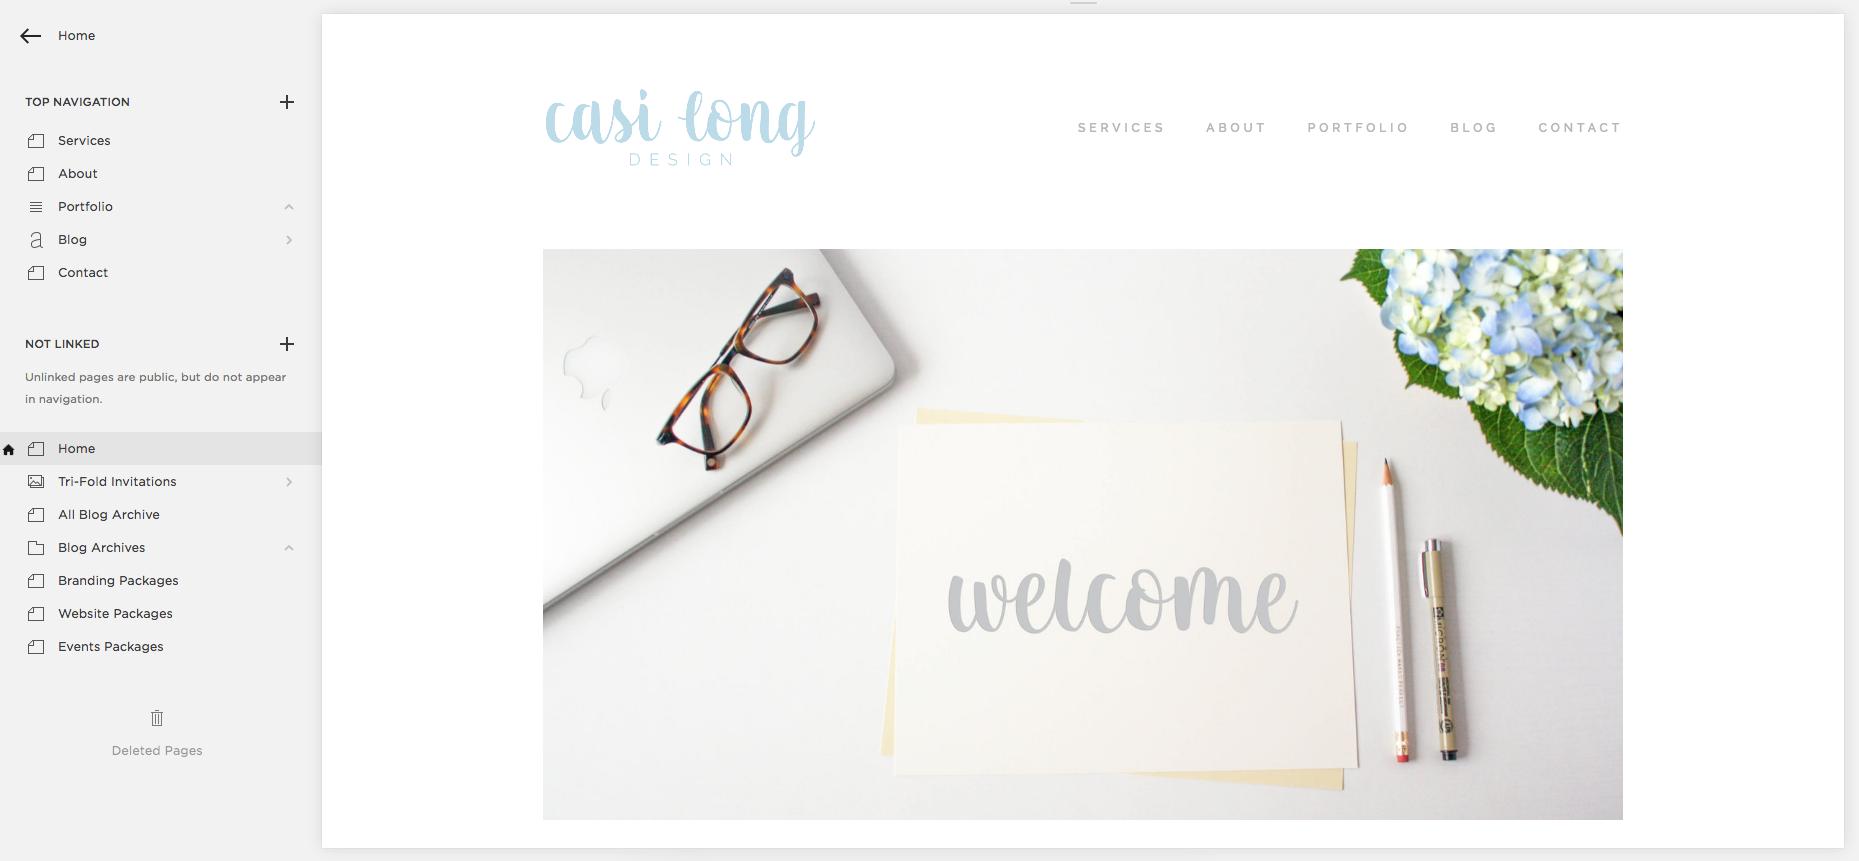 Squarespace Dashboard, Page editor   casilong.com